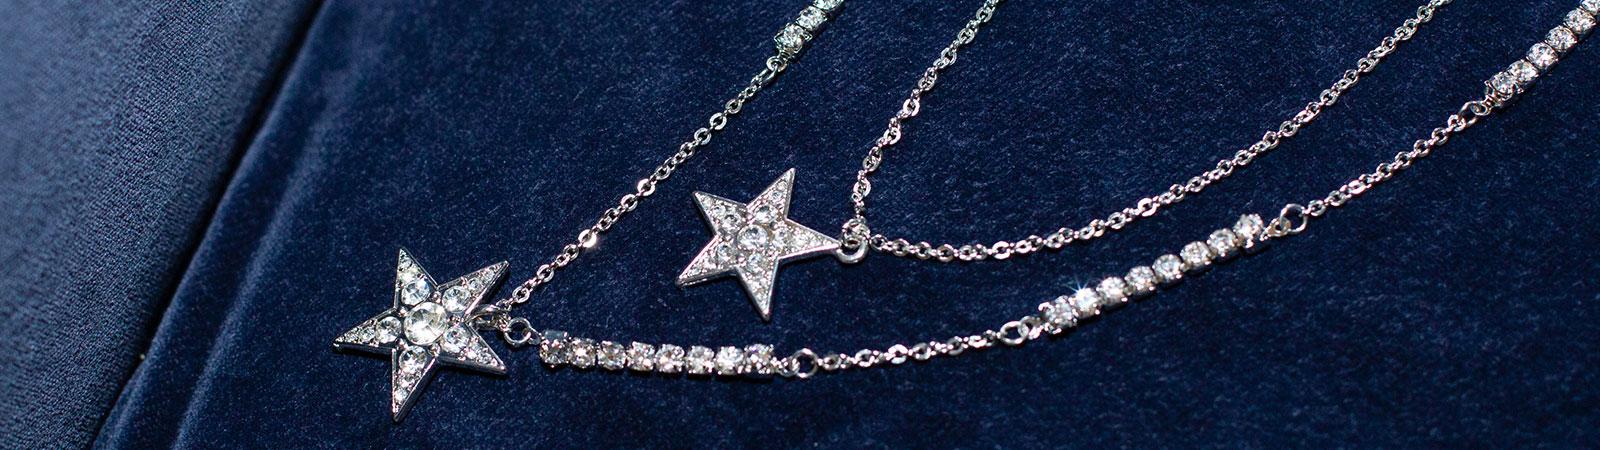 Motivi - bijoux